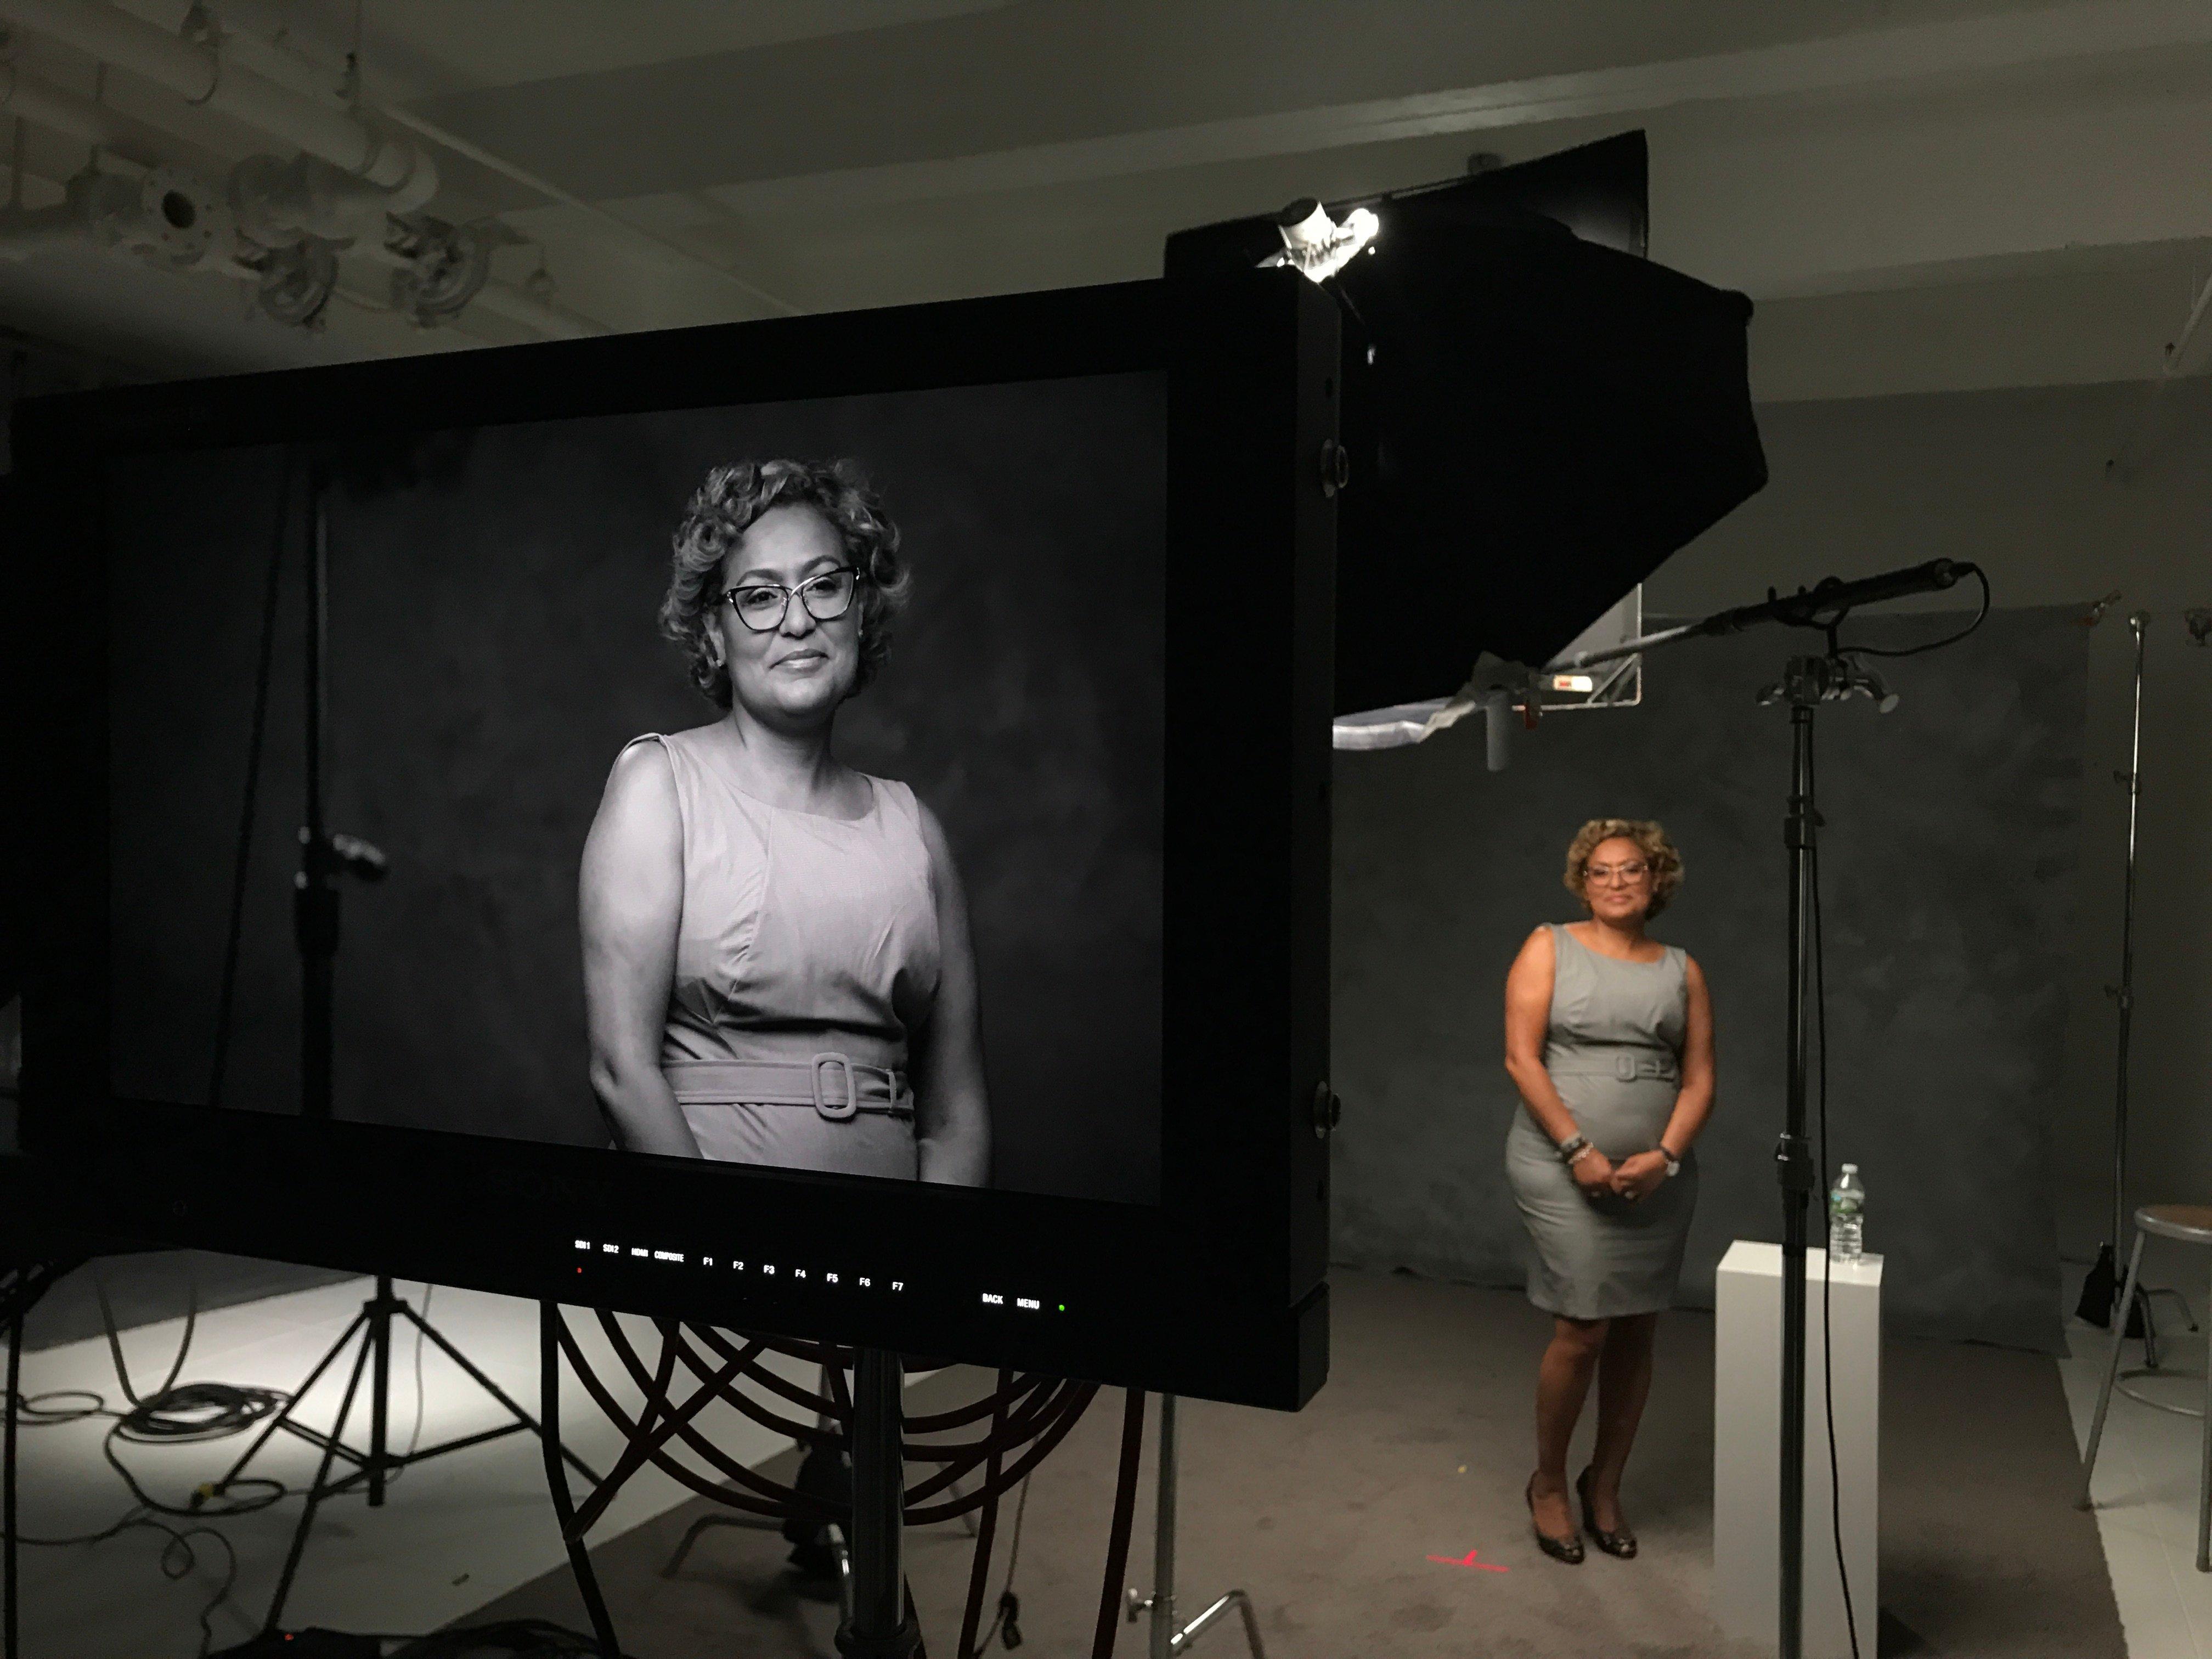 PineRock Video - Customer Testimonial Video Shoot